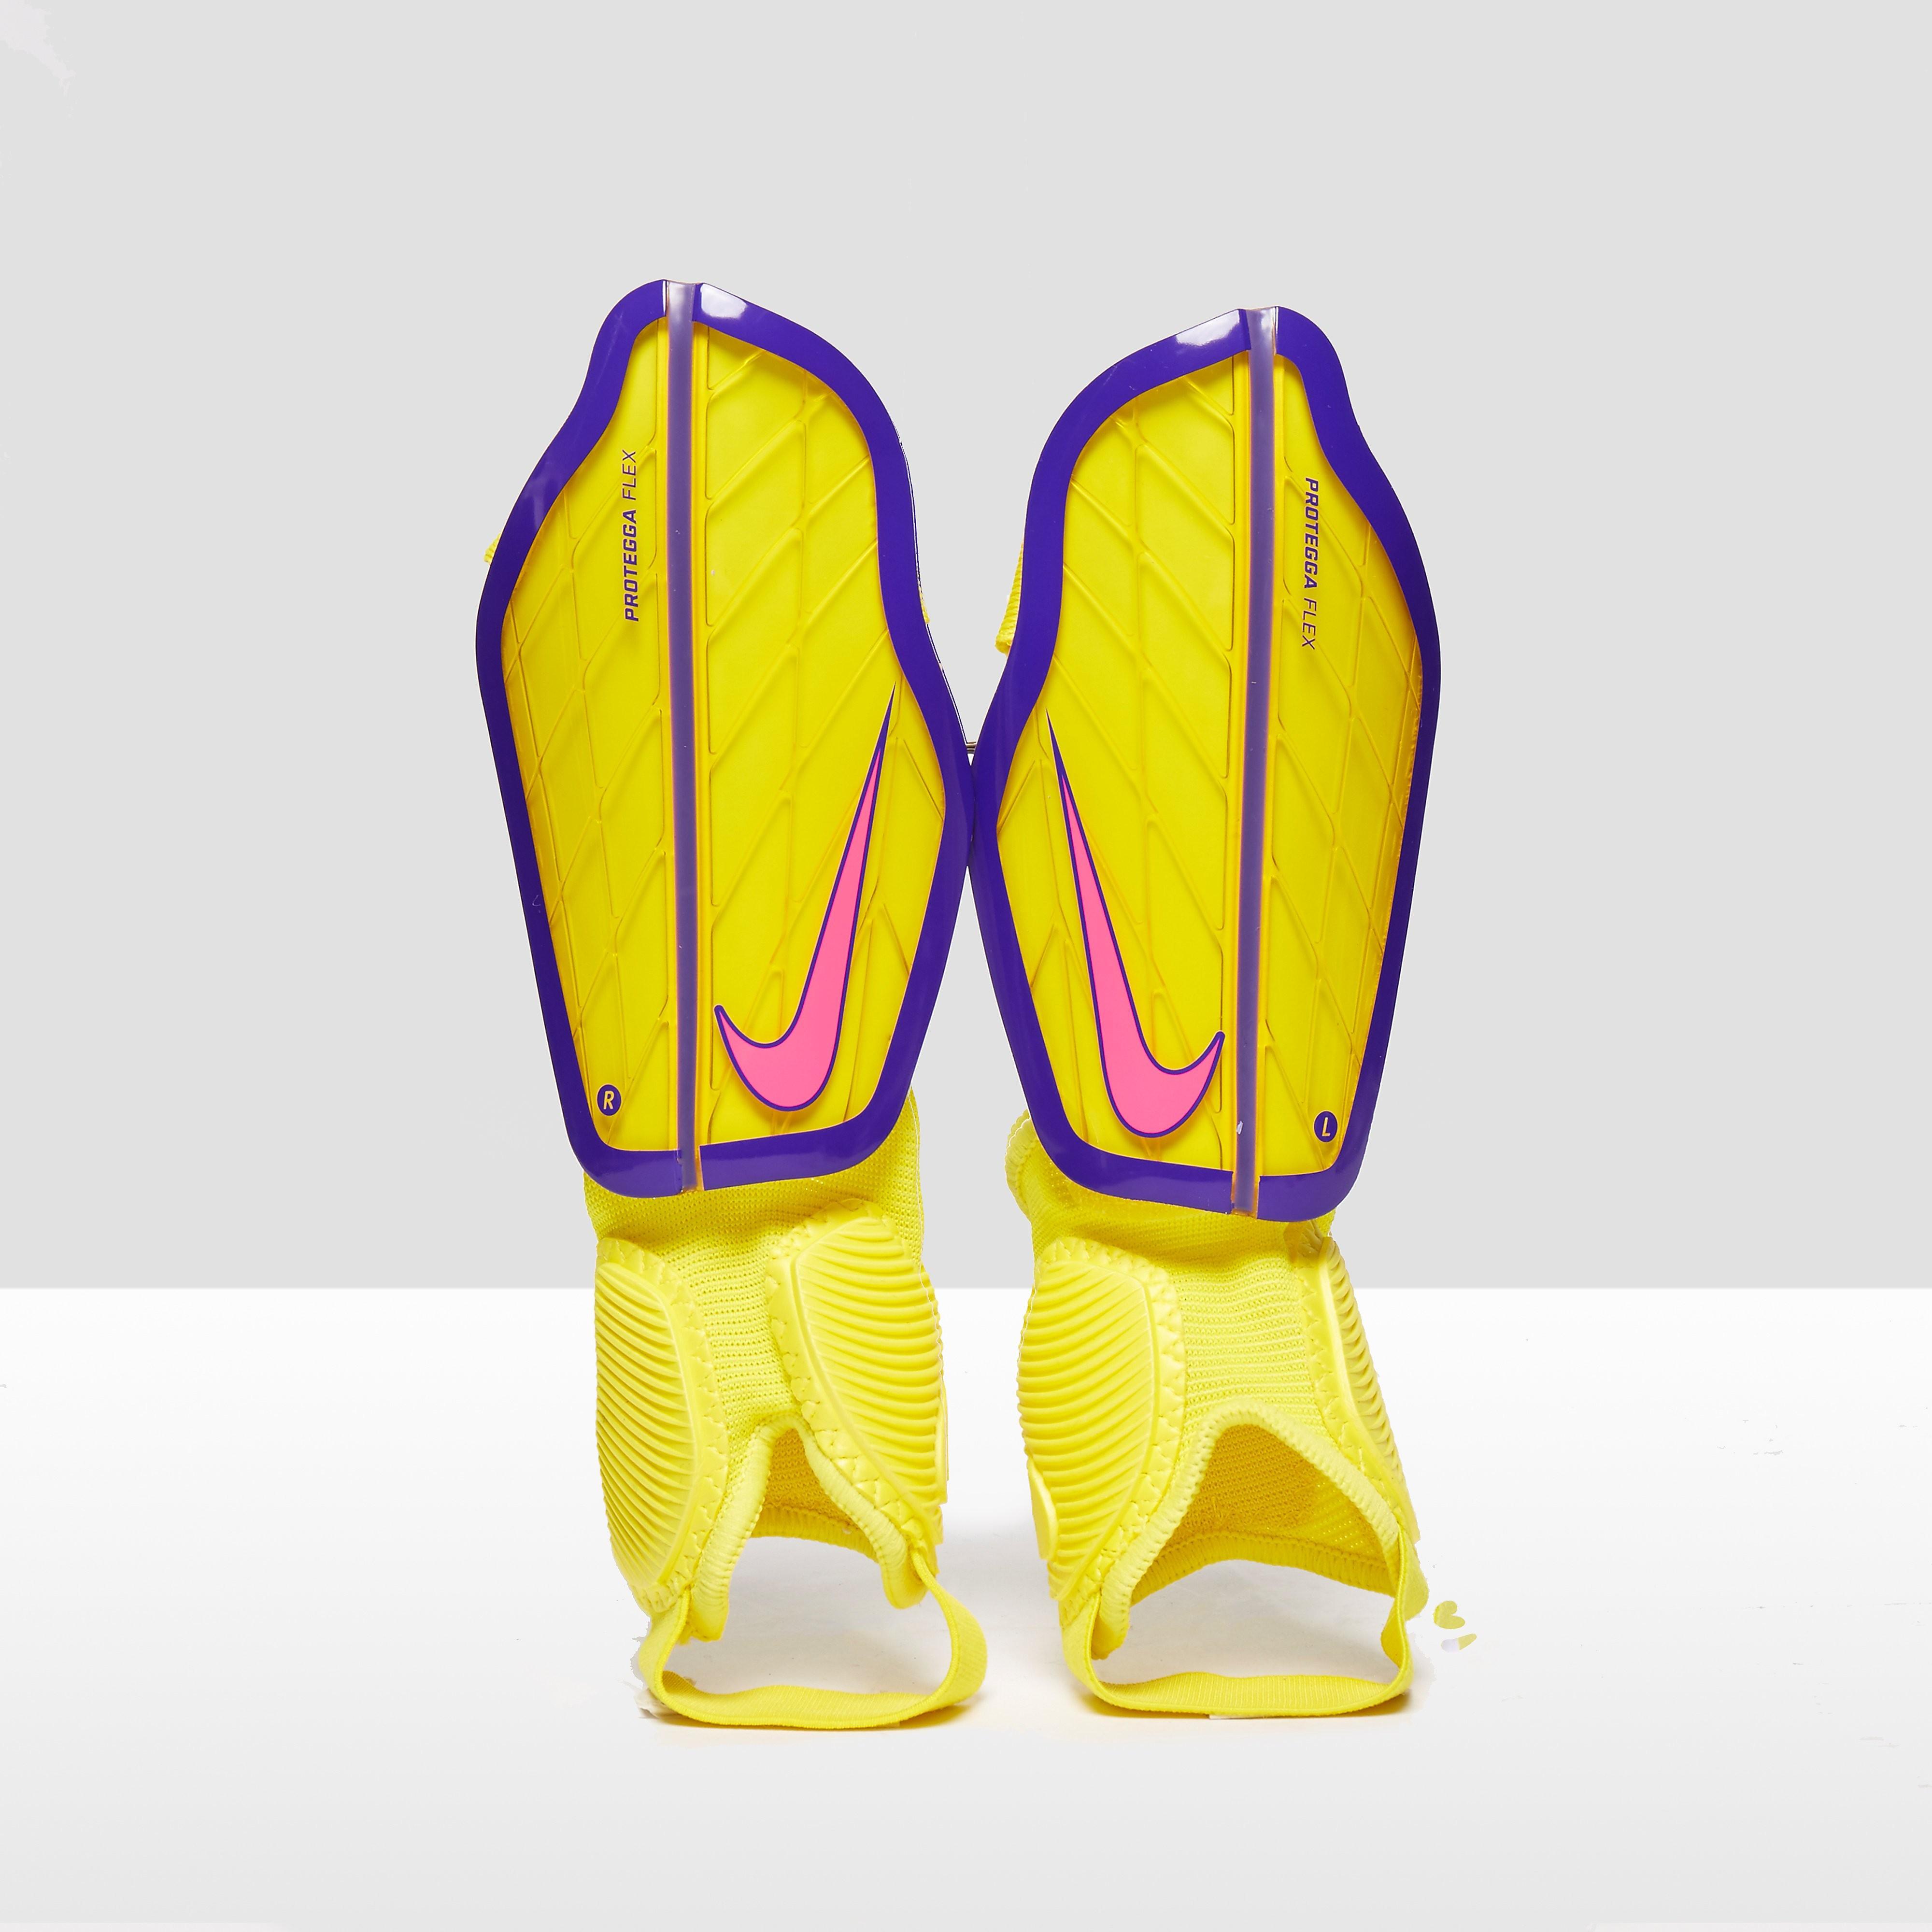 Nike Men's Protegga Flex Football Shin Guards